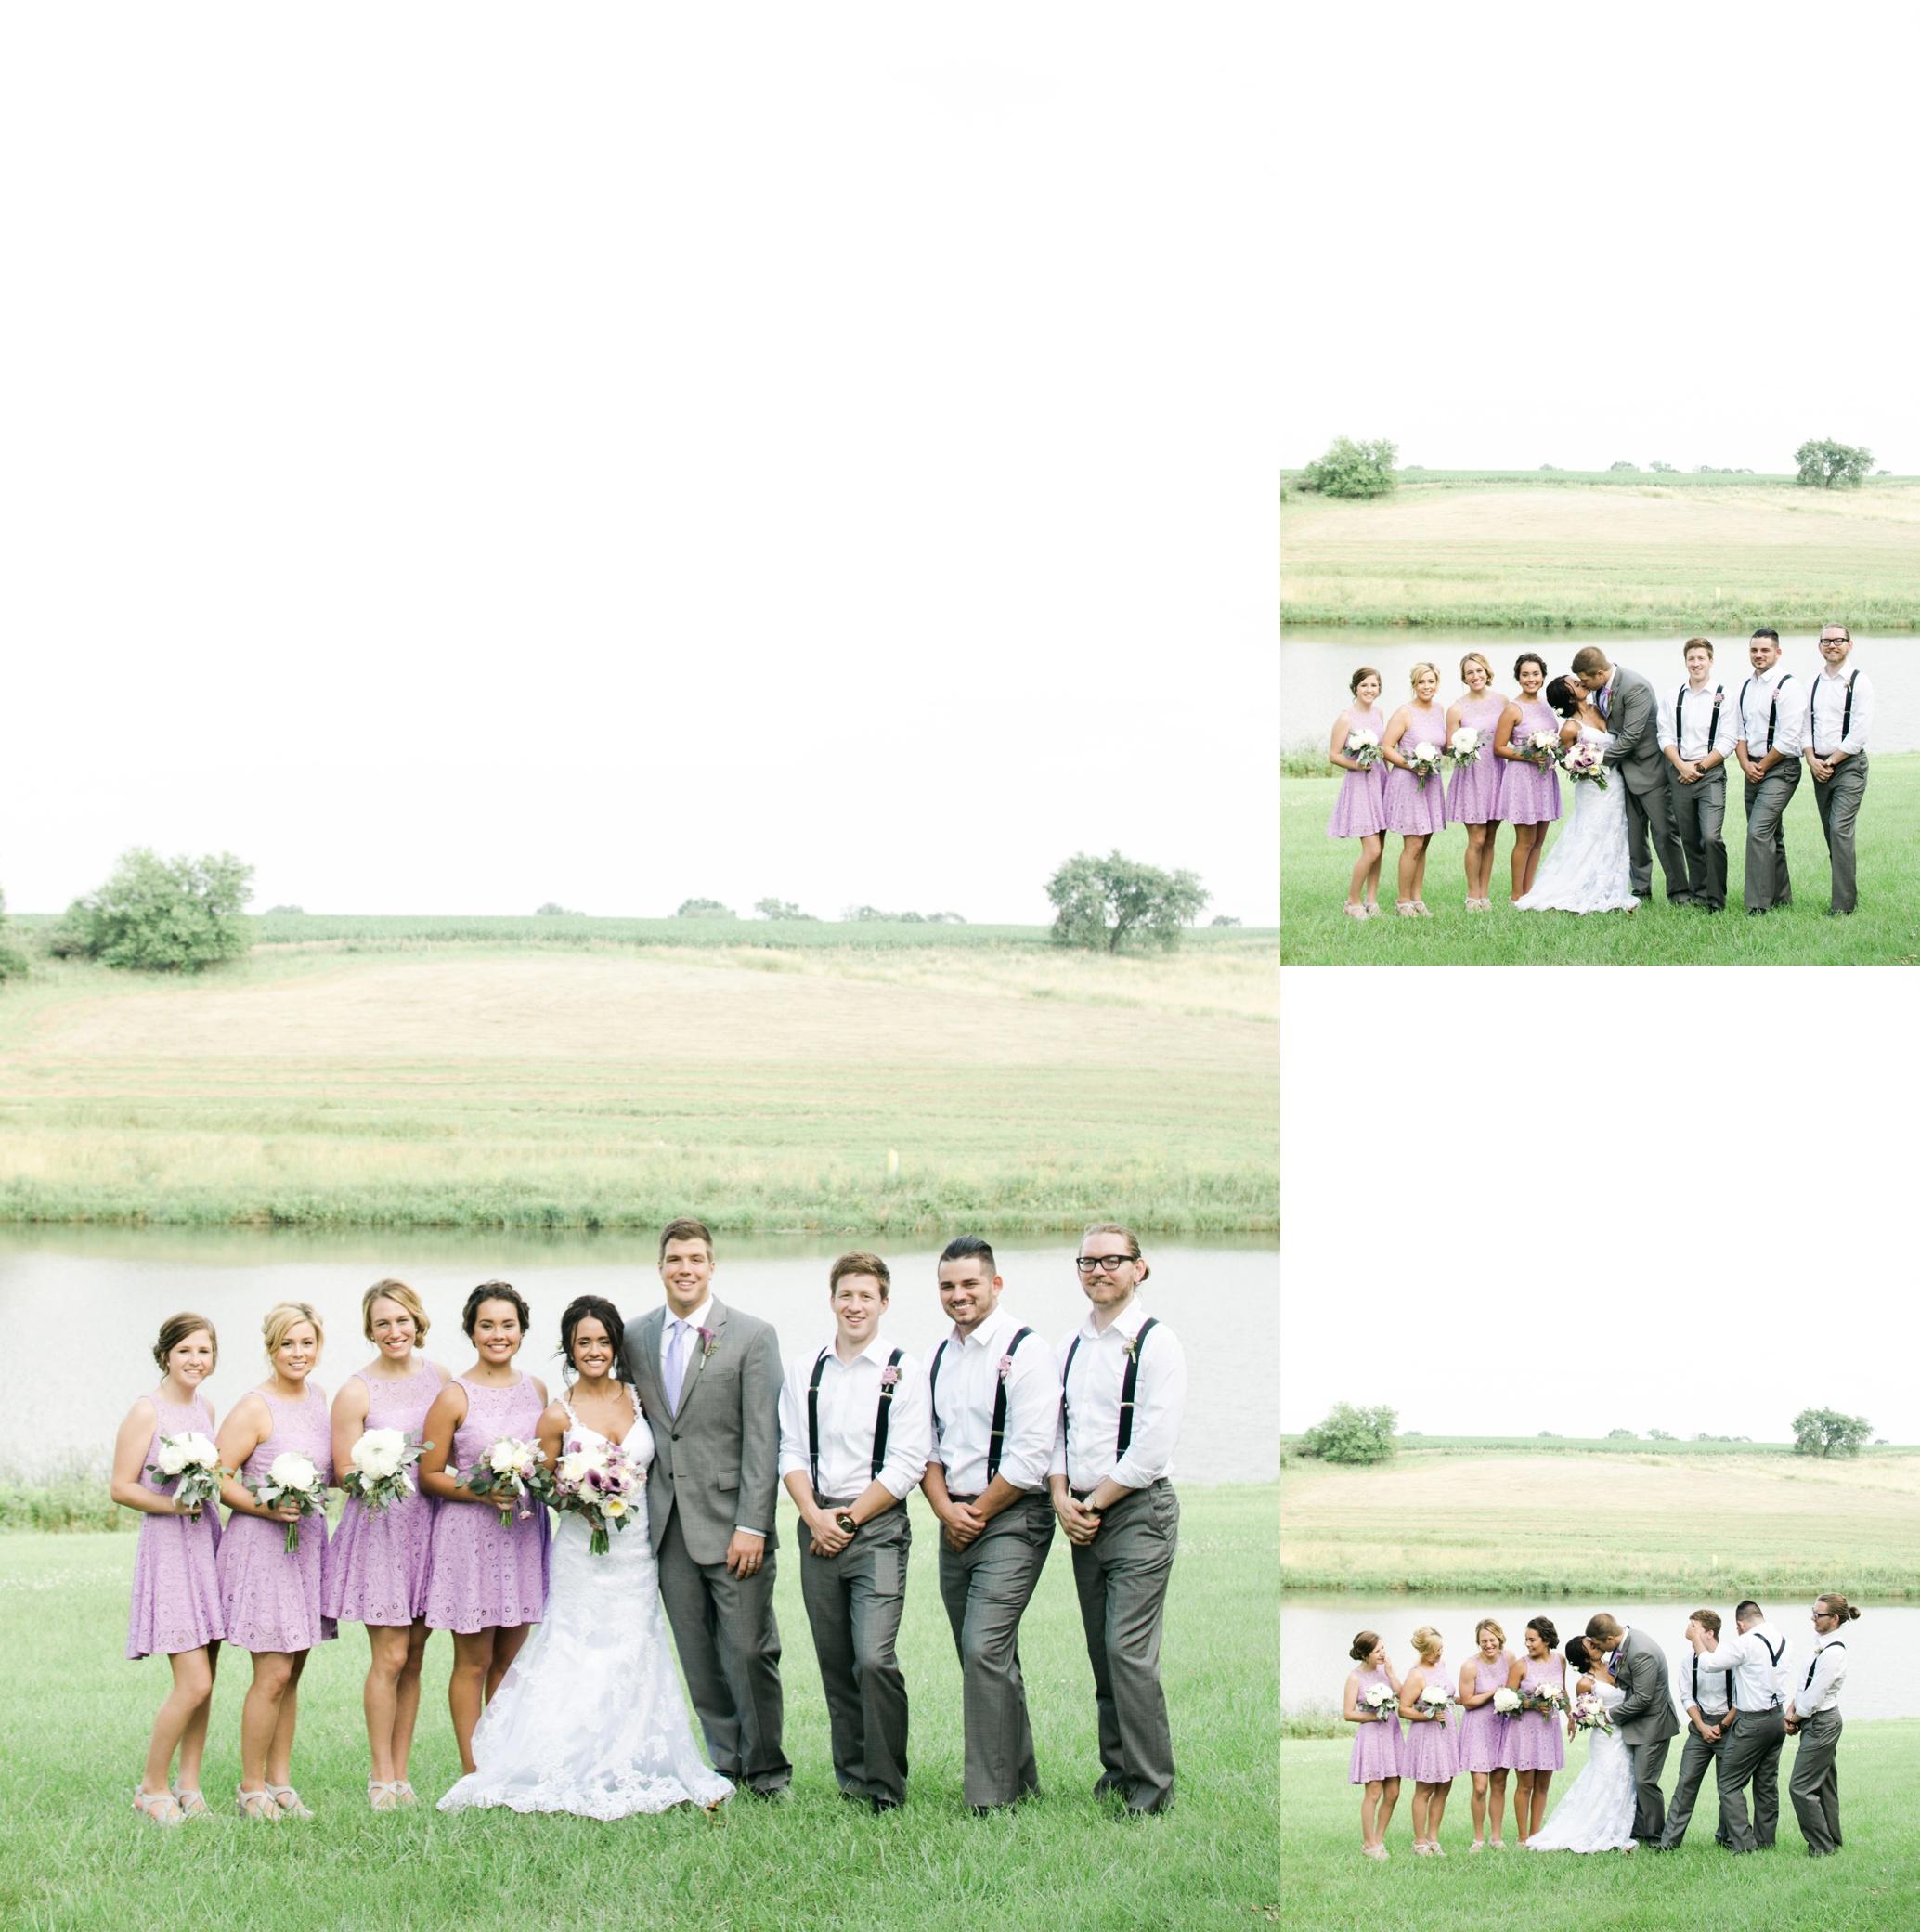 Barnes' Place Rustic Outdoor Wedding | Ali Leigh Photo Minneapolis Wedding Photographer_0140.jpg